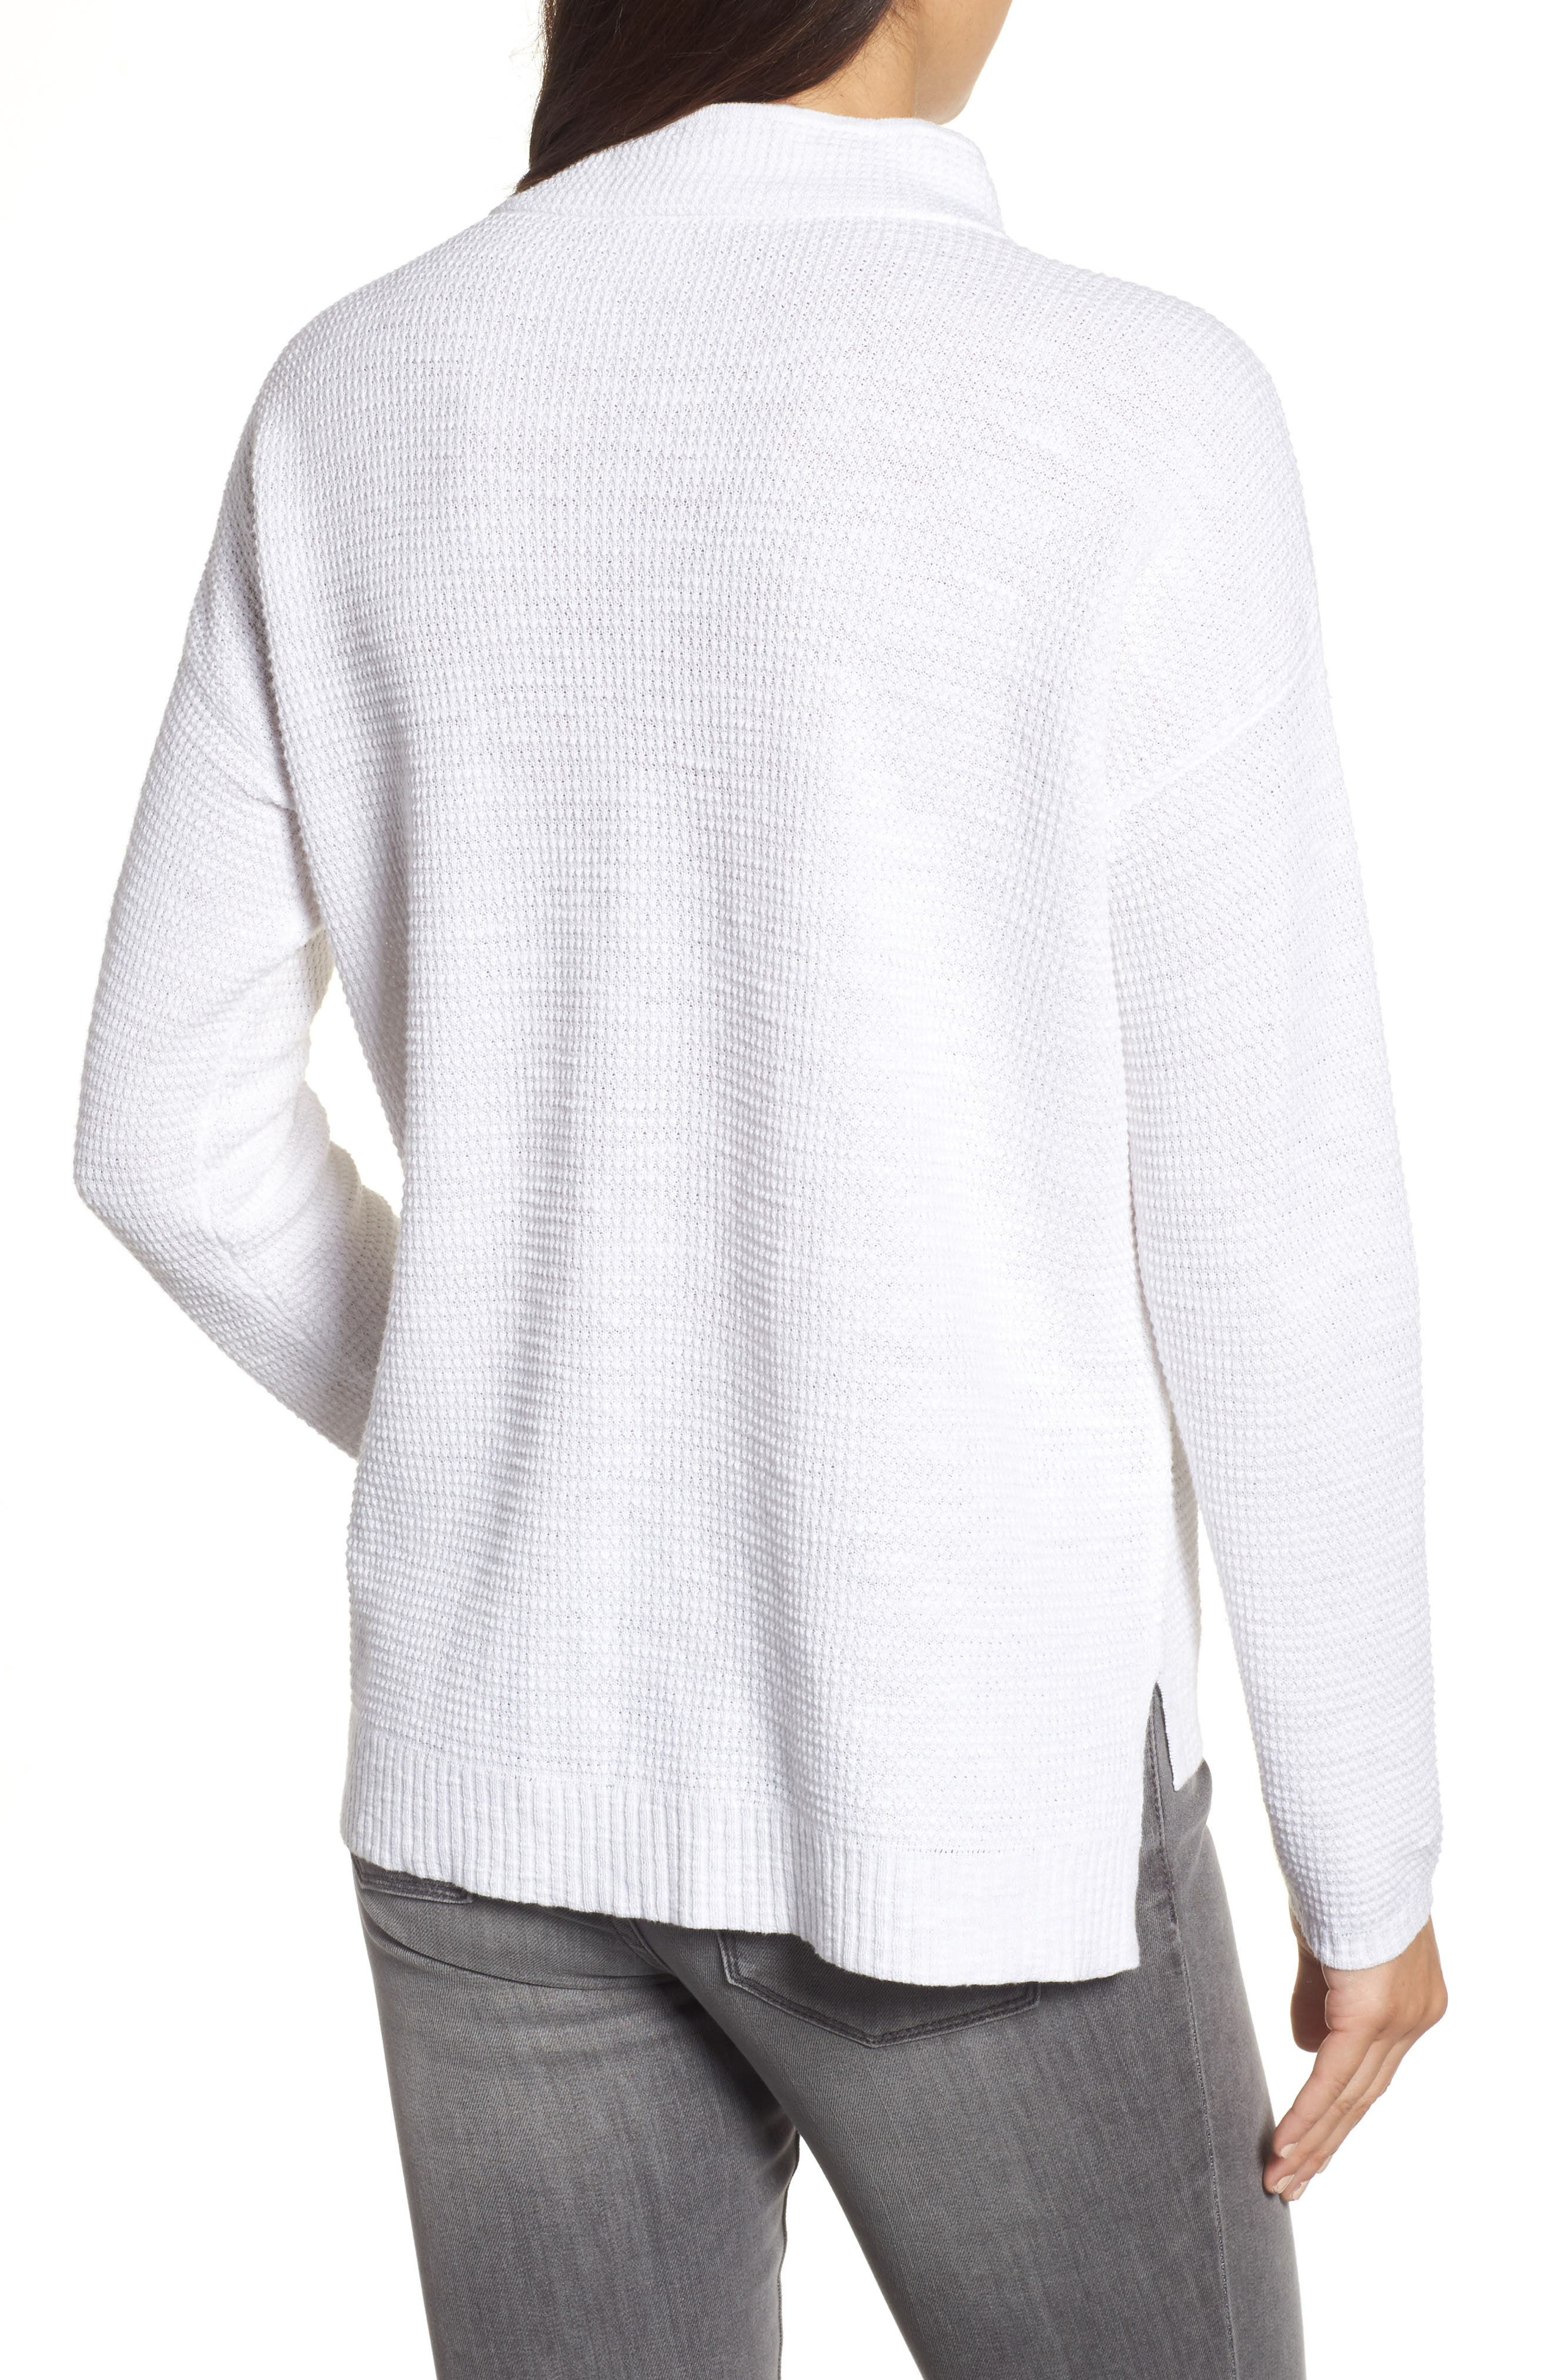 Drawstring Neck Organic Linen & Cotton Top,                             Alternate thumbnail 2, color,                             100